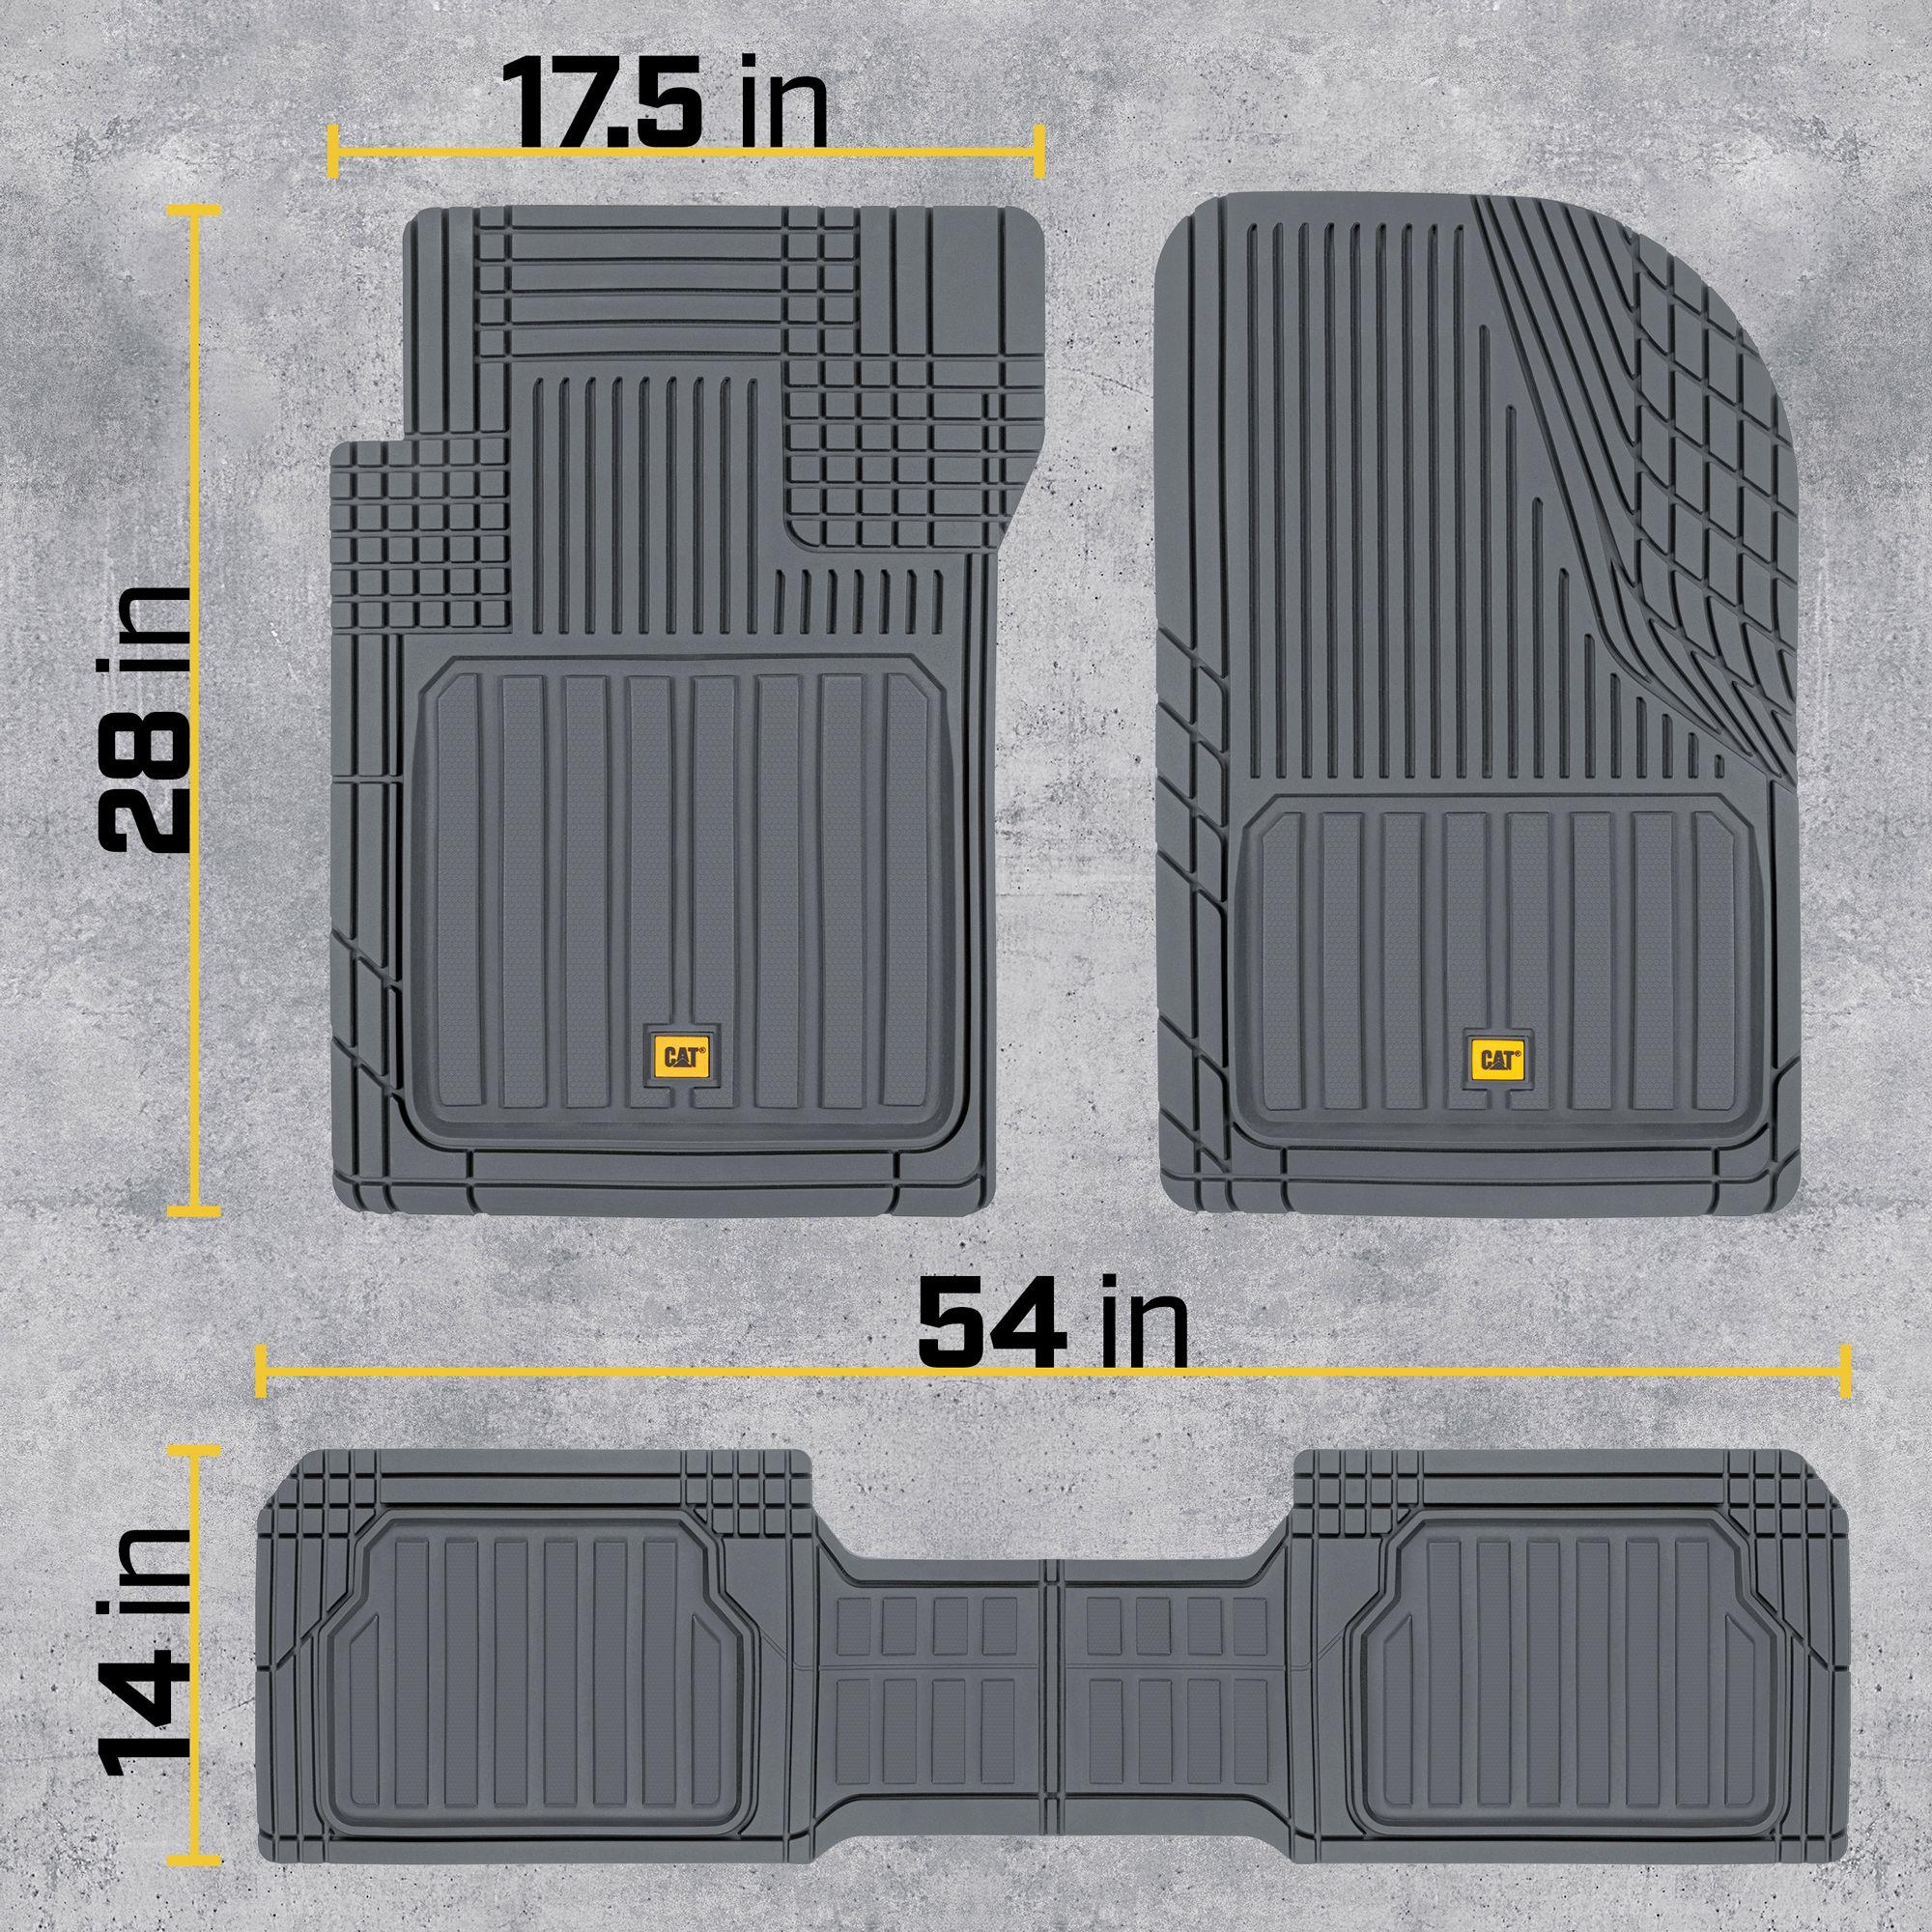 CAMT-8303-BK